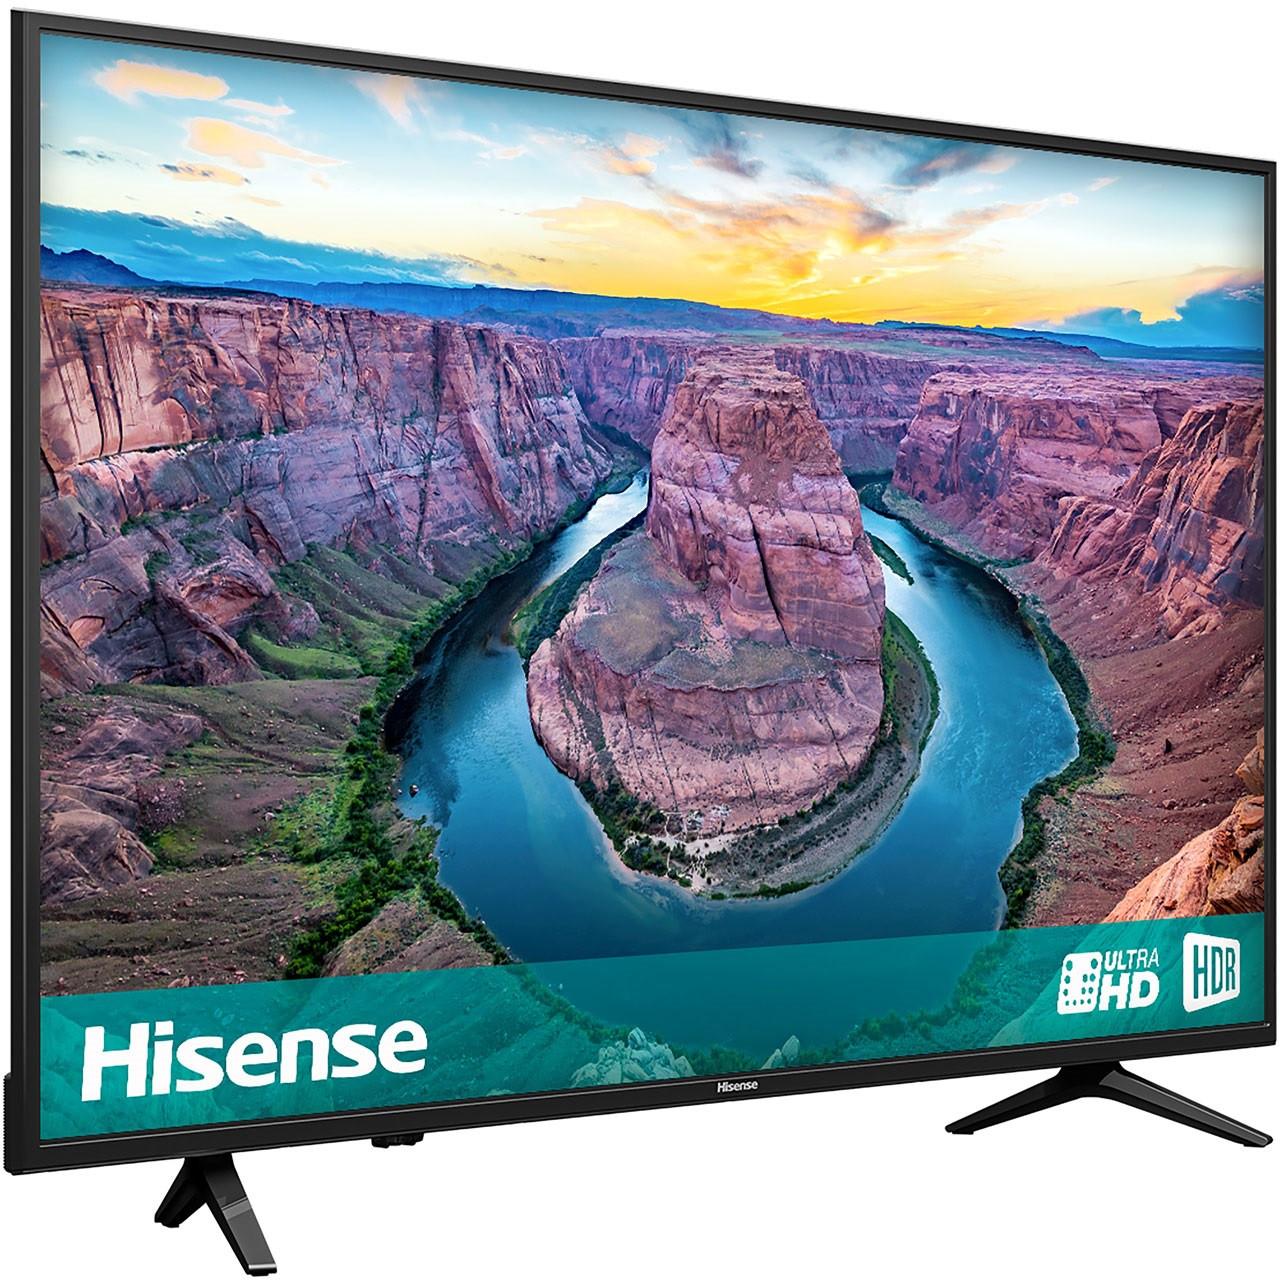 Ремонт телевизоров Hisense